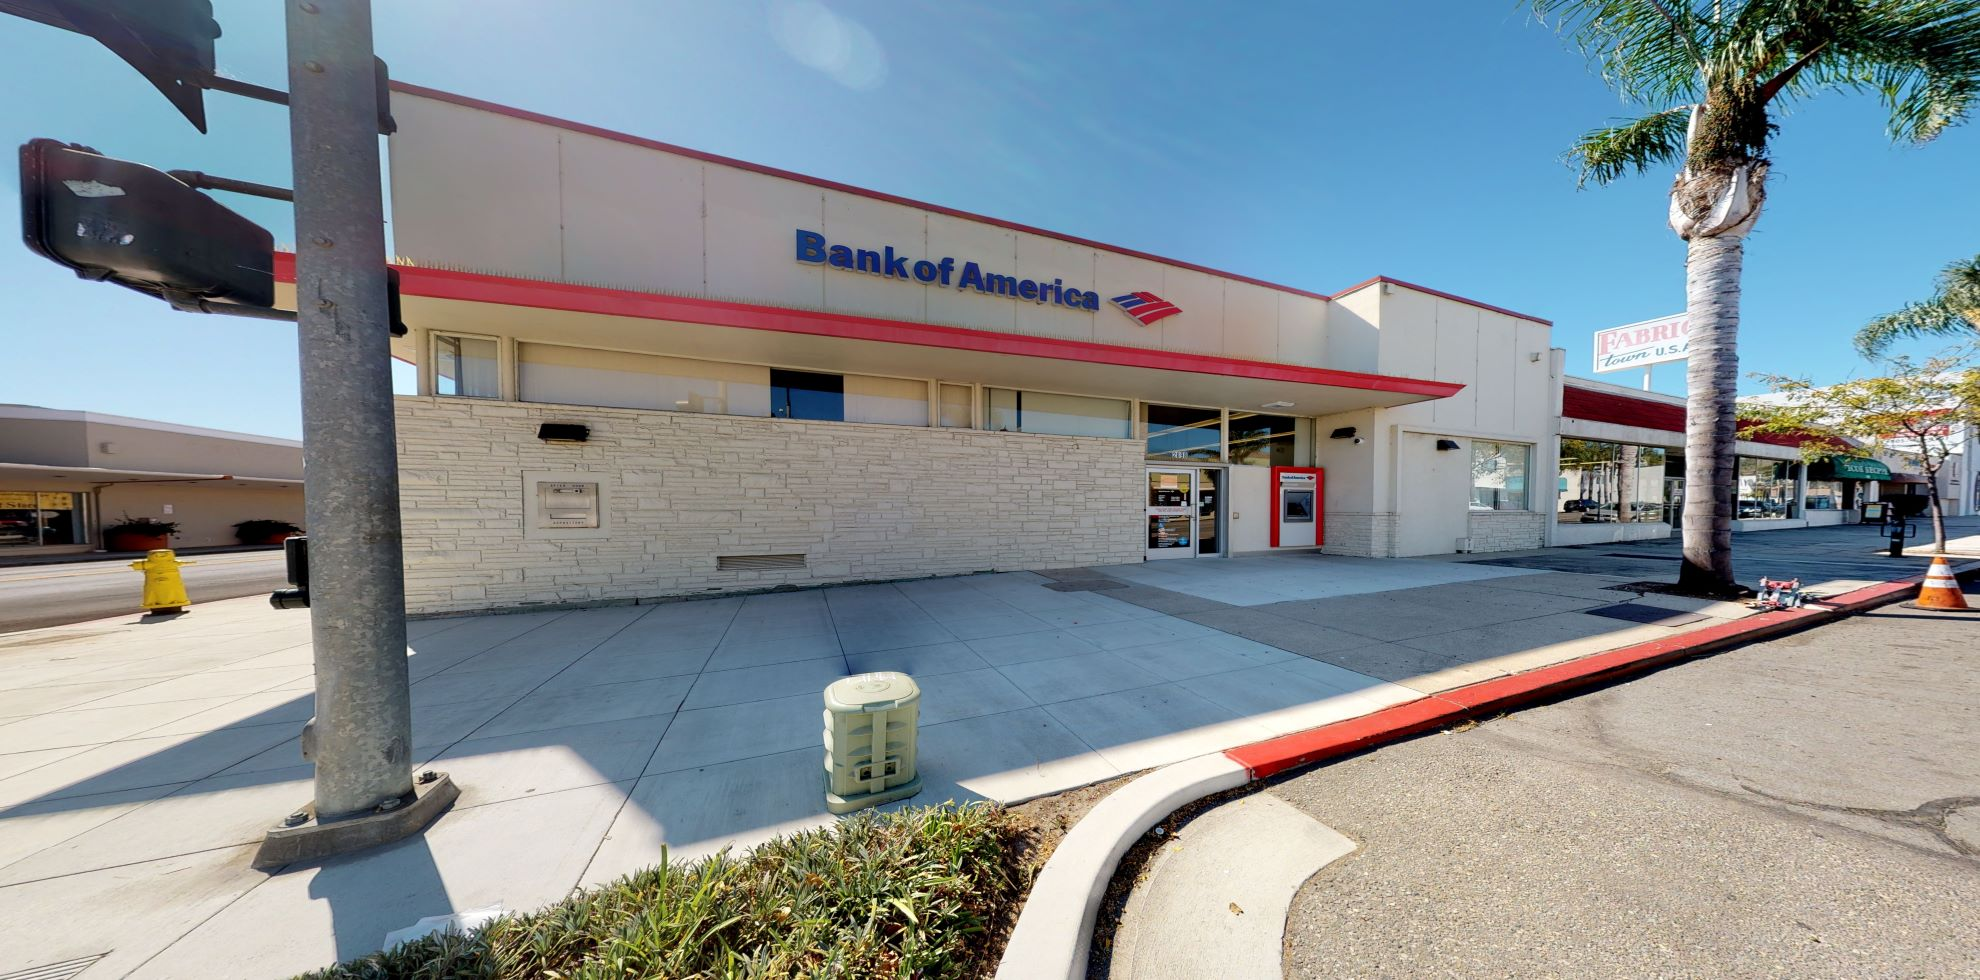 Bank of America financial center with walk-up ATM | 2698 E Main St, Ventura, CA 93003